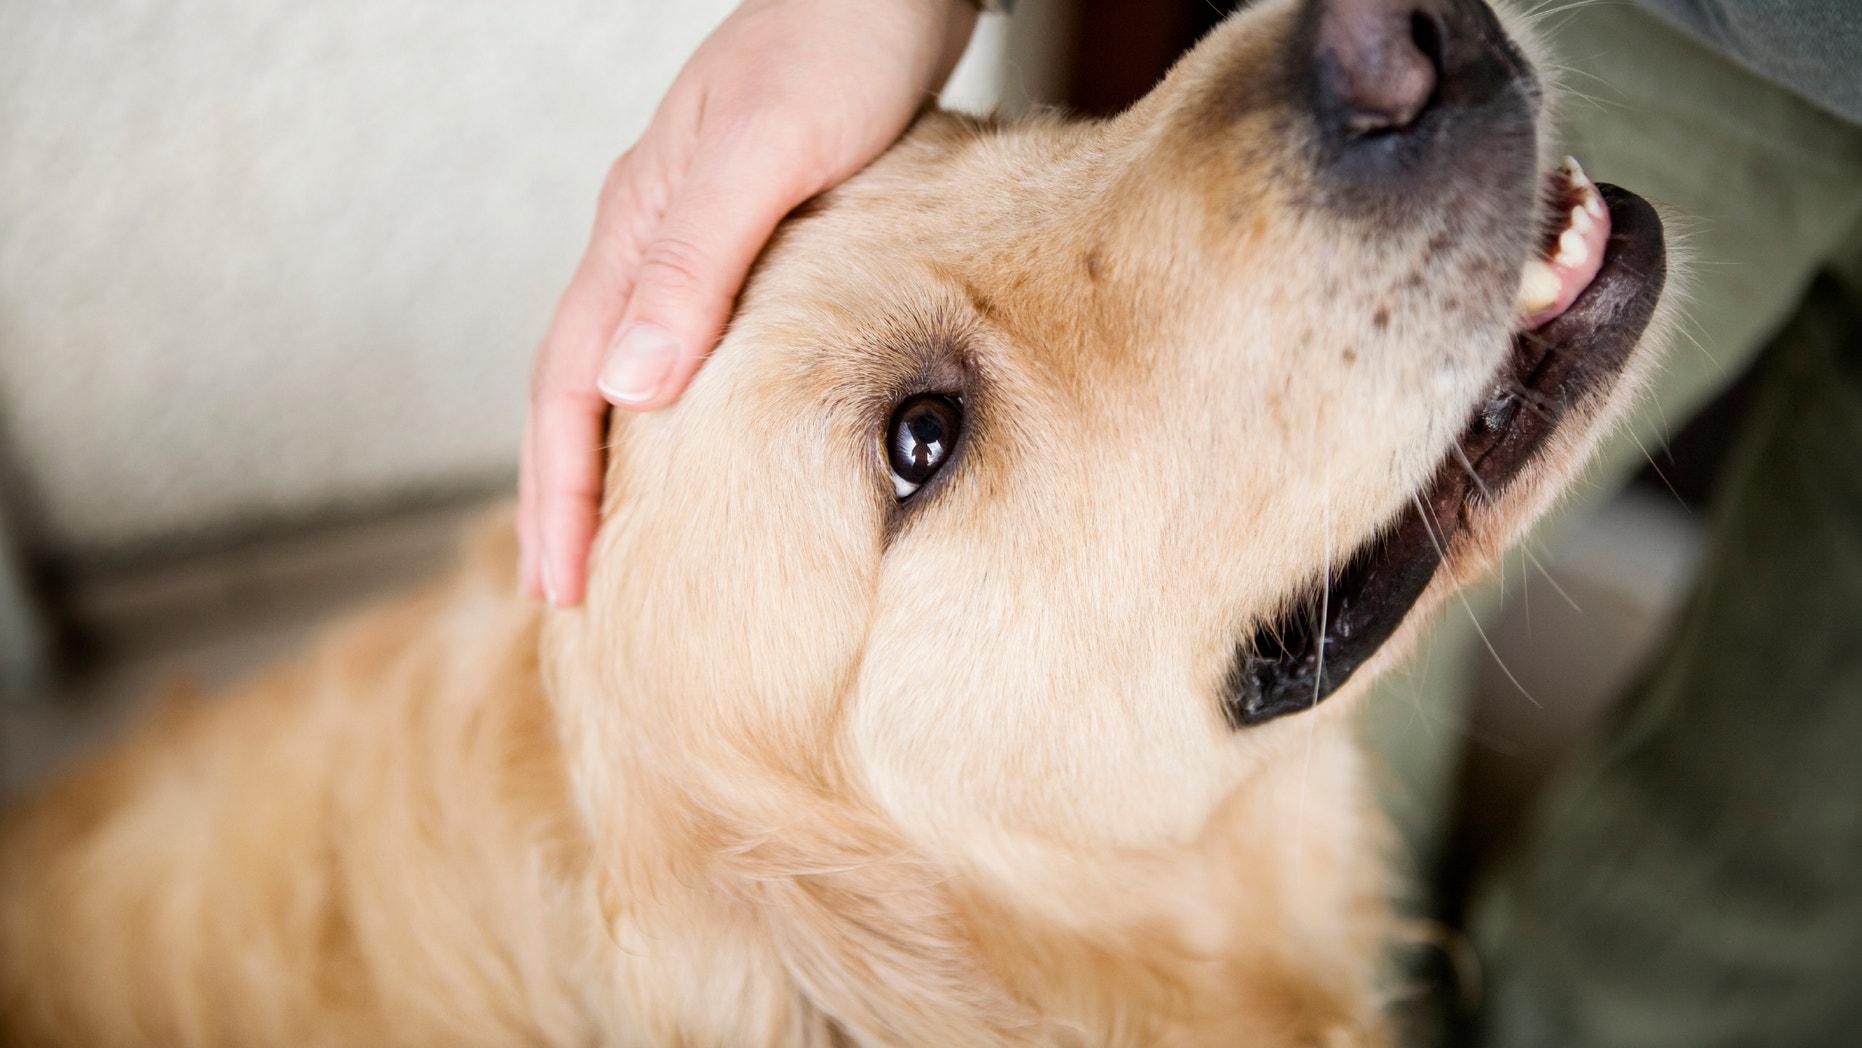 Hand caressing dog's head